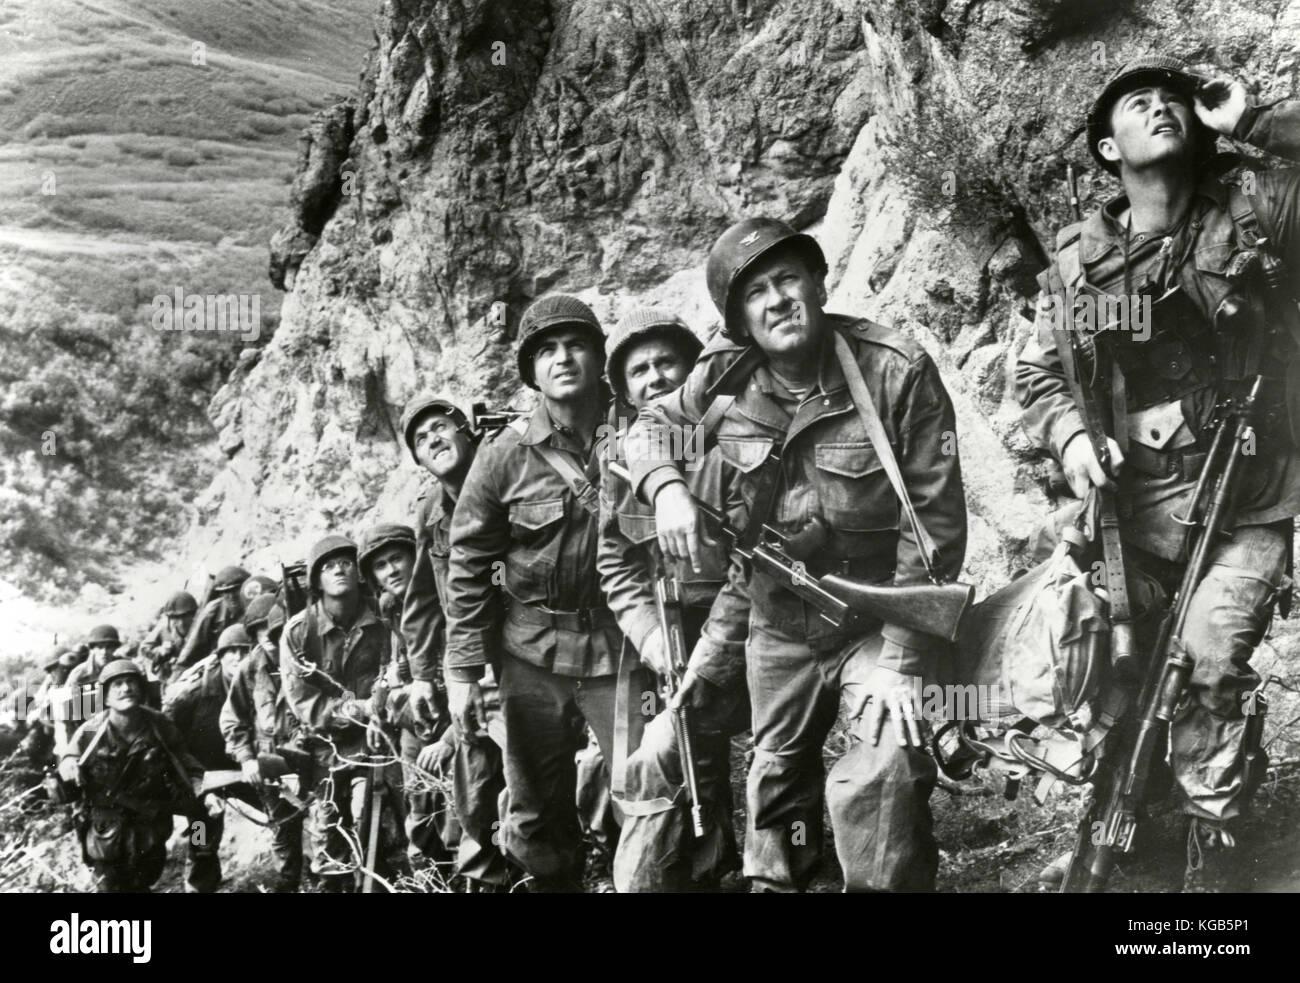 Actor William Holden in the movie The Devil's Brigade, 1968 - Stock Image